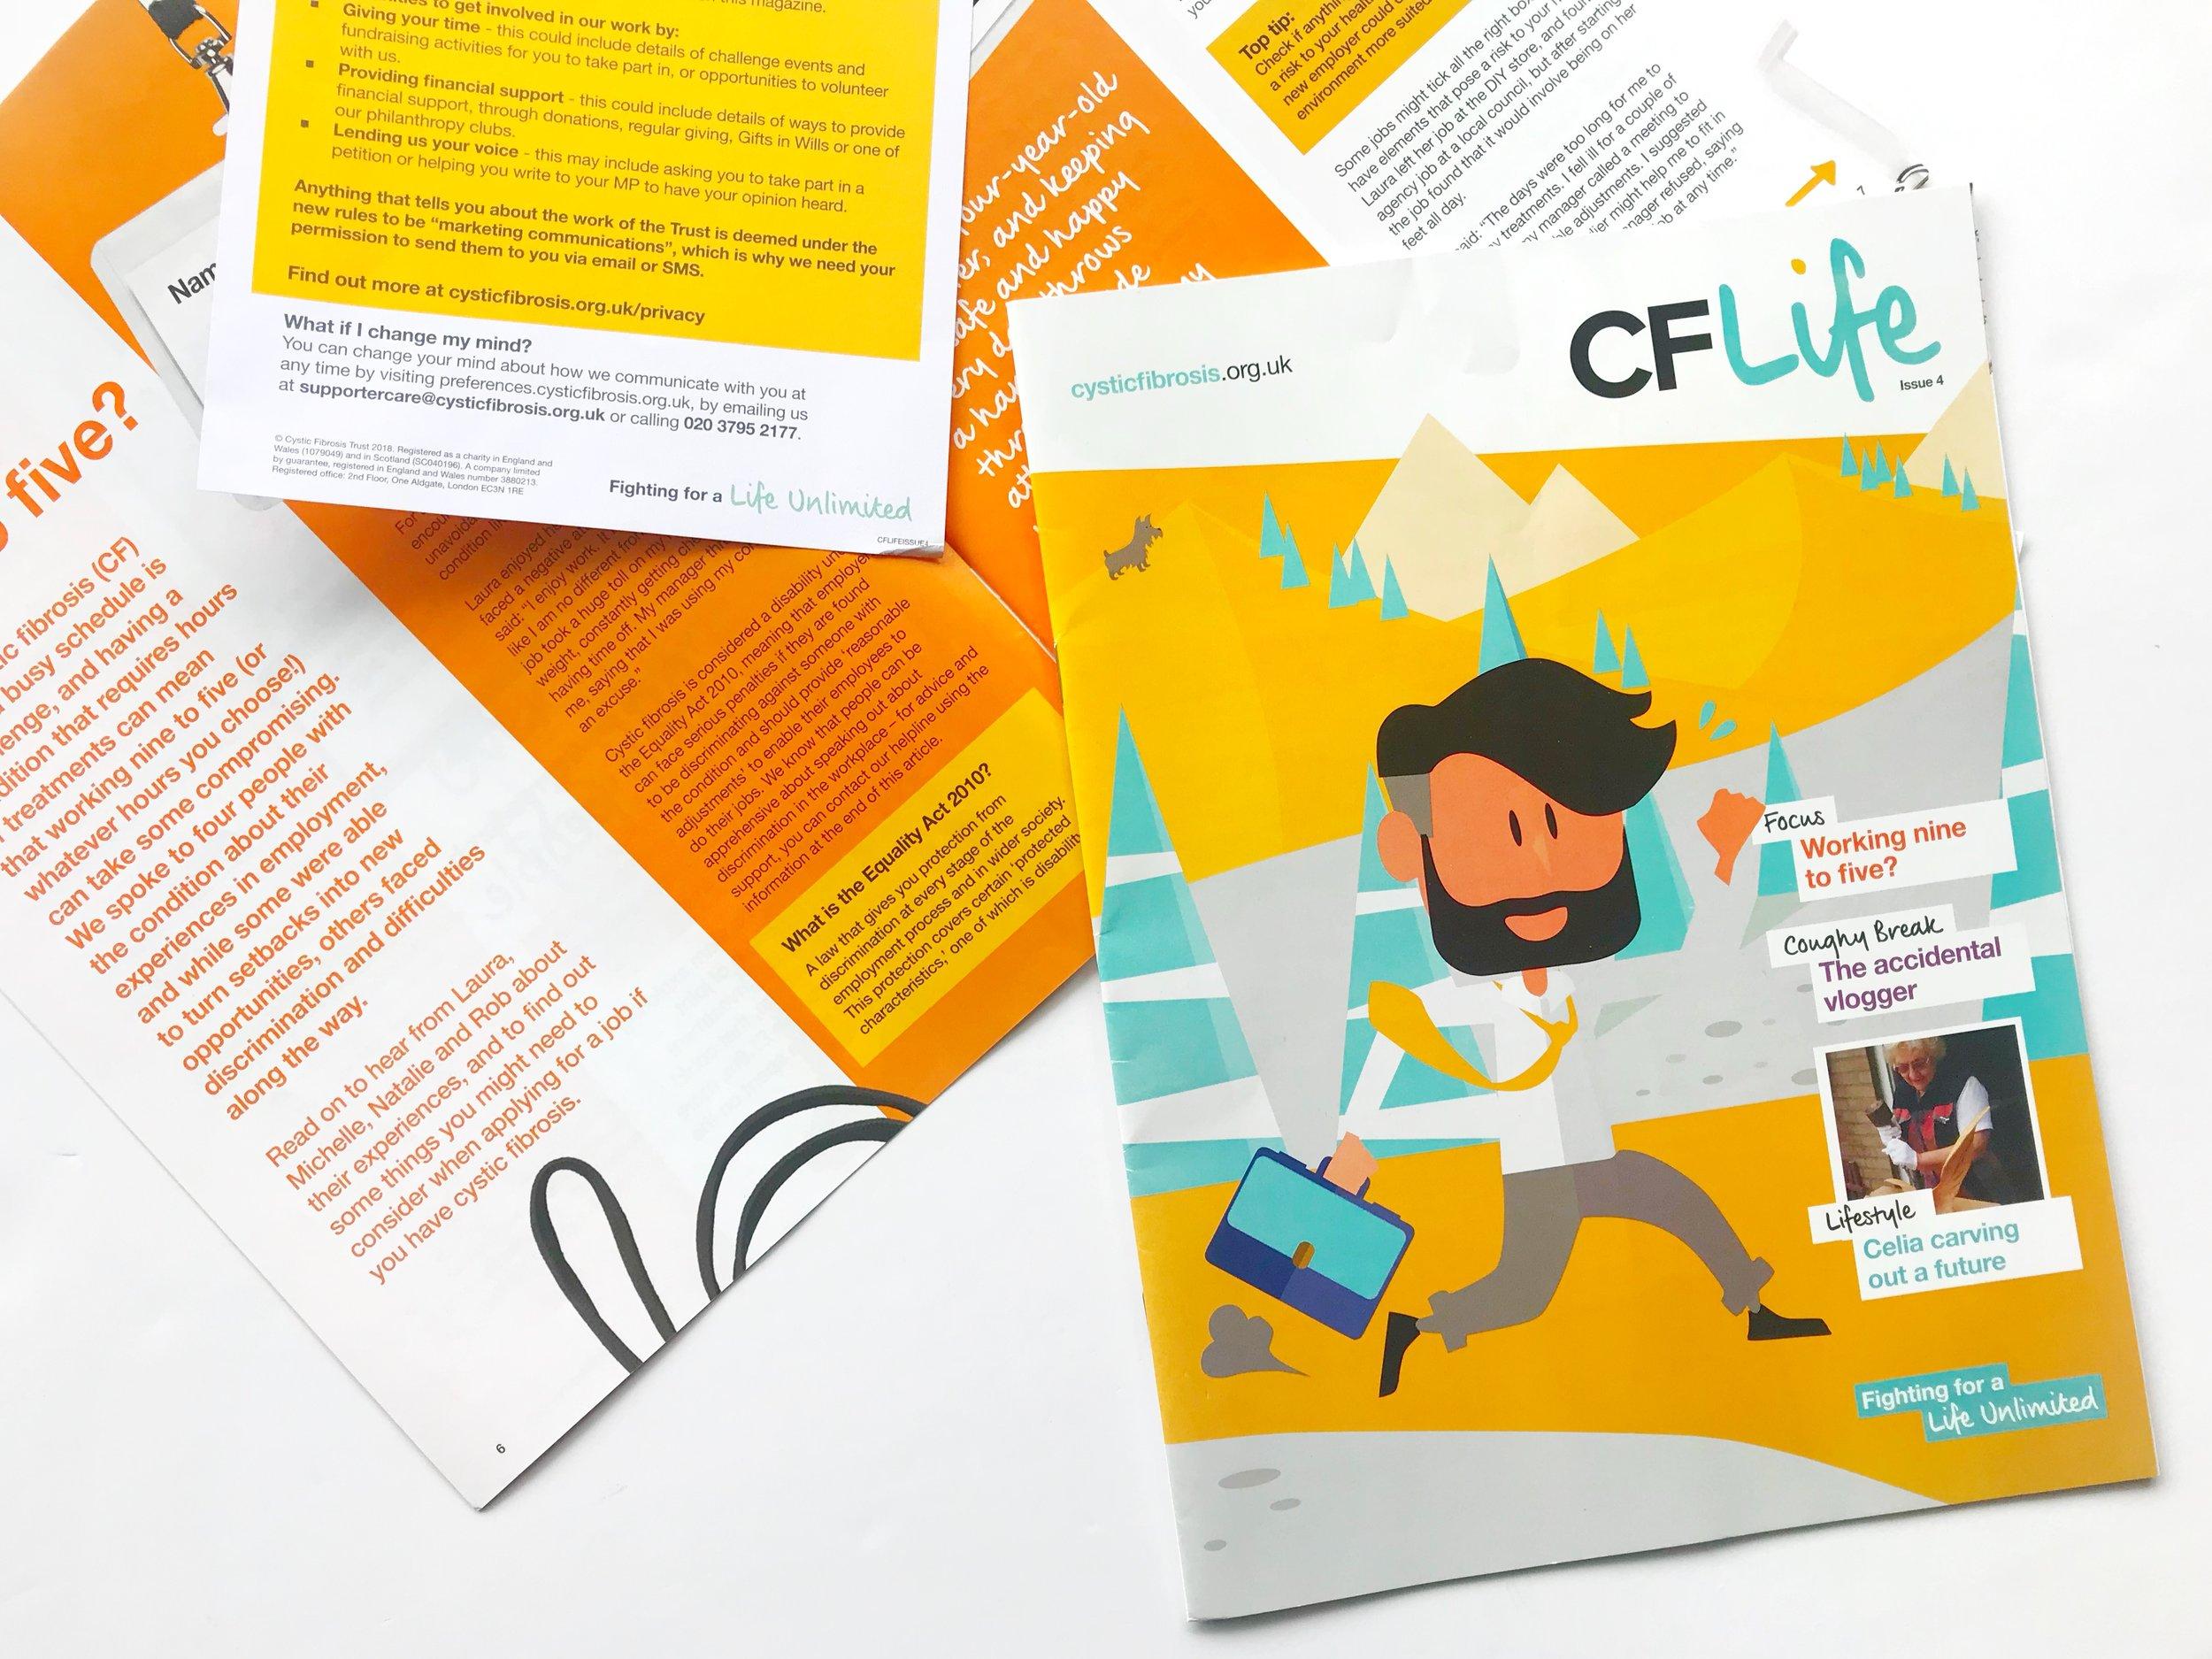 Cystic-Fibrosis-CF-Life-Magazine-Work-Career-Article-Natalie-Goodchild-fitness